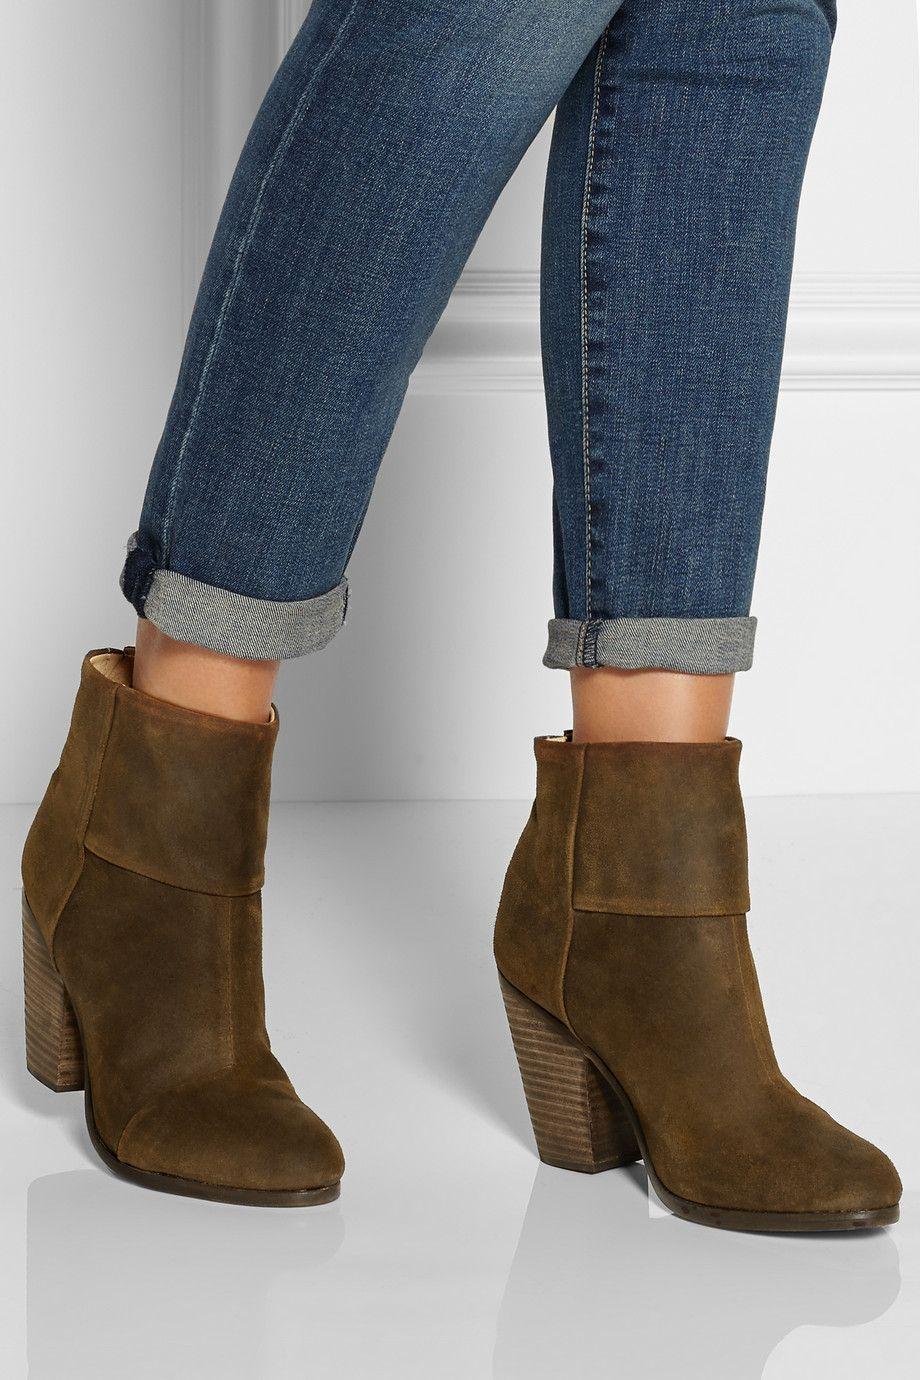 discount big sale discount sast Rag & Bone Suede Newbury Ankle Boots bMX3yc8